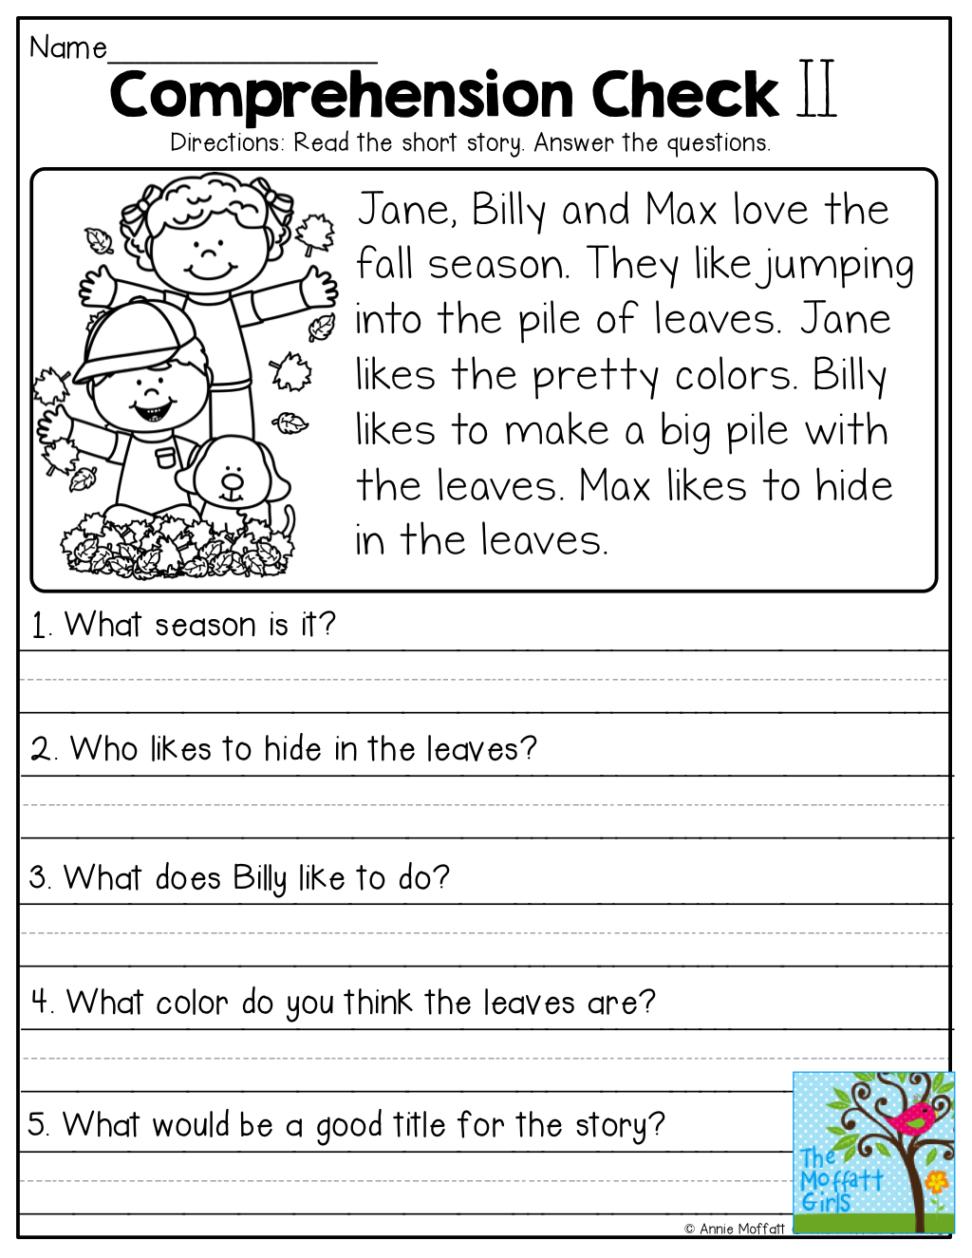 Worksheet. Free Printable Reading Comprehension Worksheets - Free Printable Reading Comprehension Worksheets